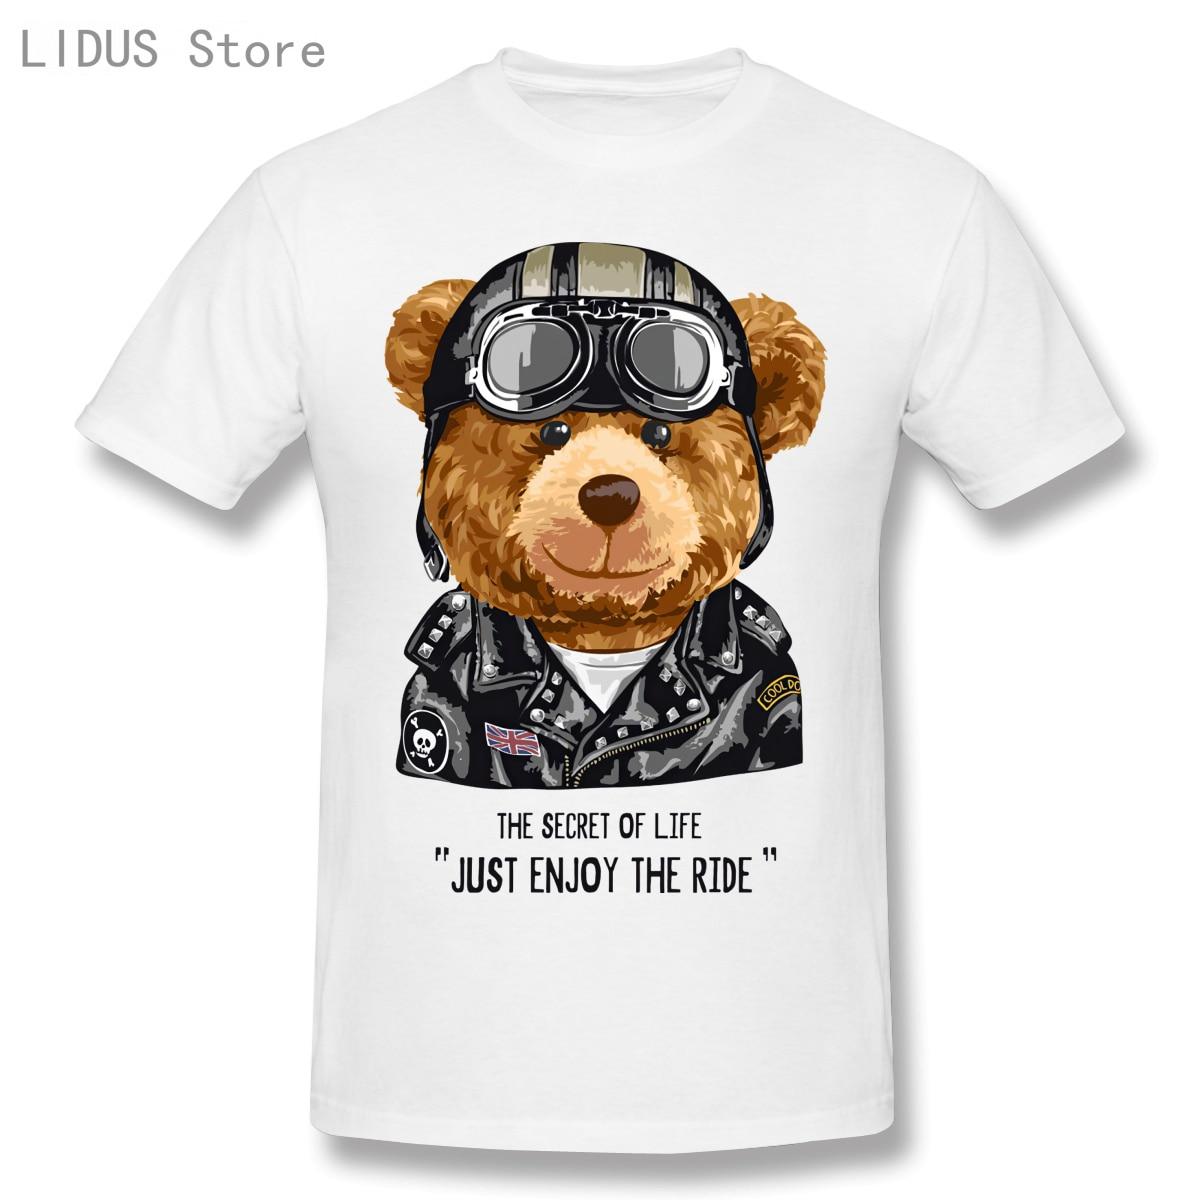 2021 Fashion T Shirts Funny Bear Short Sleeve Casual Men O-neck 100% Cotton T-Shirts Tee Top